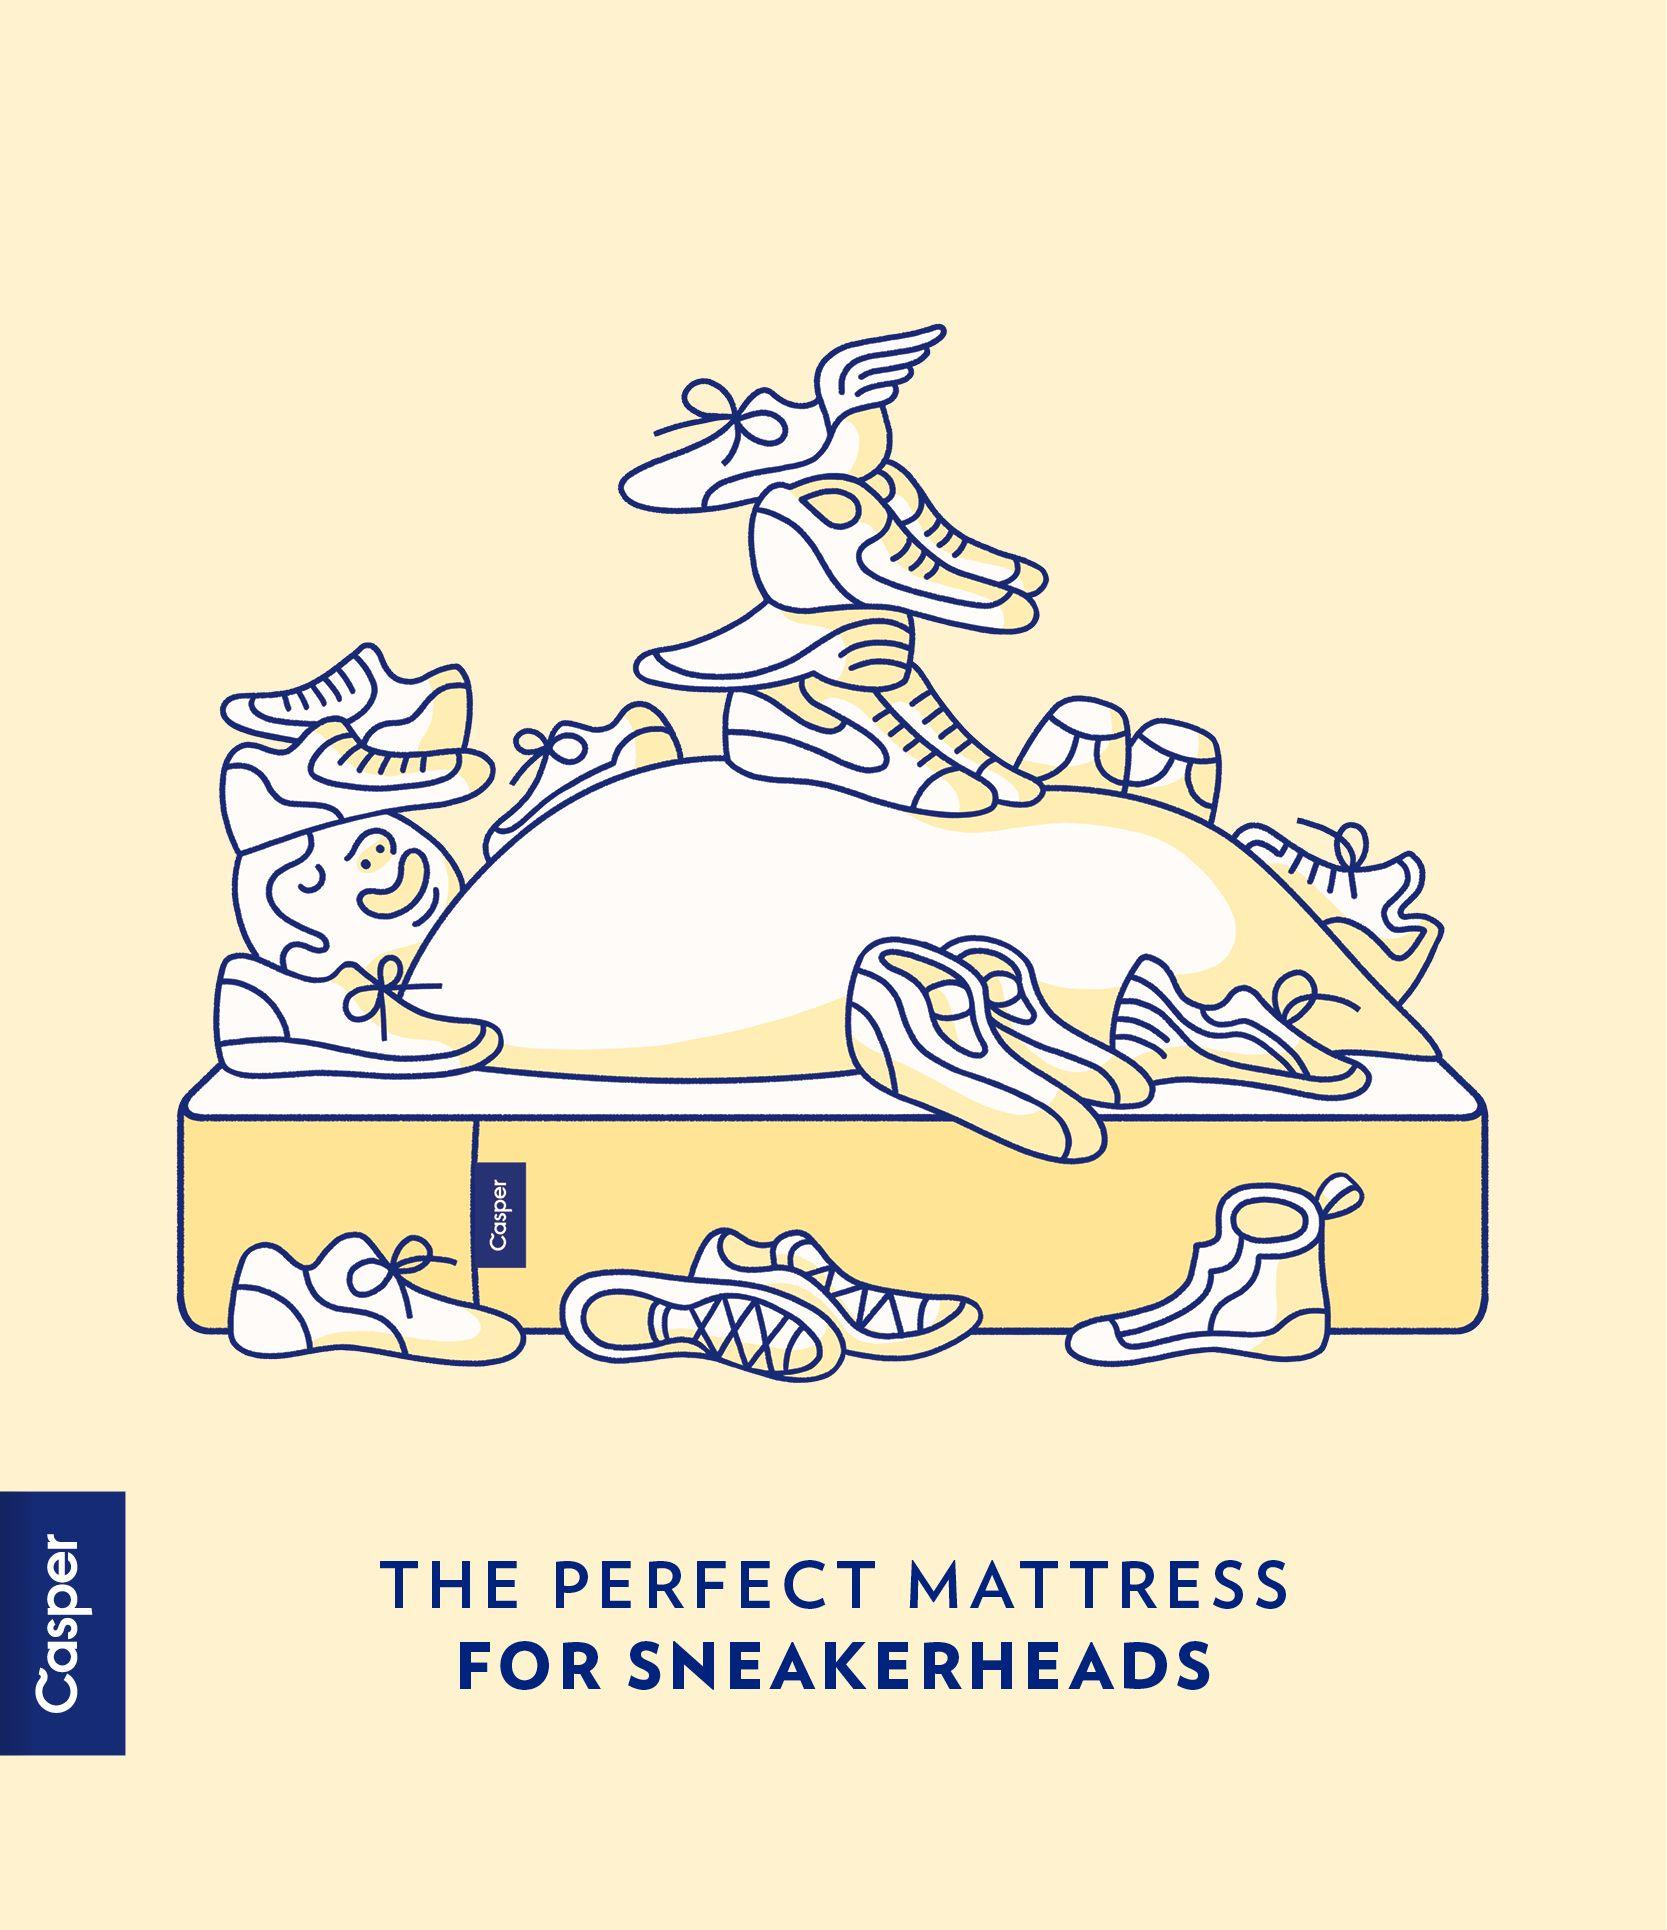 Casper the perfect mattress for sneakerheads. Creative